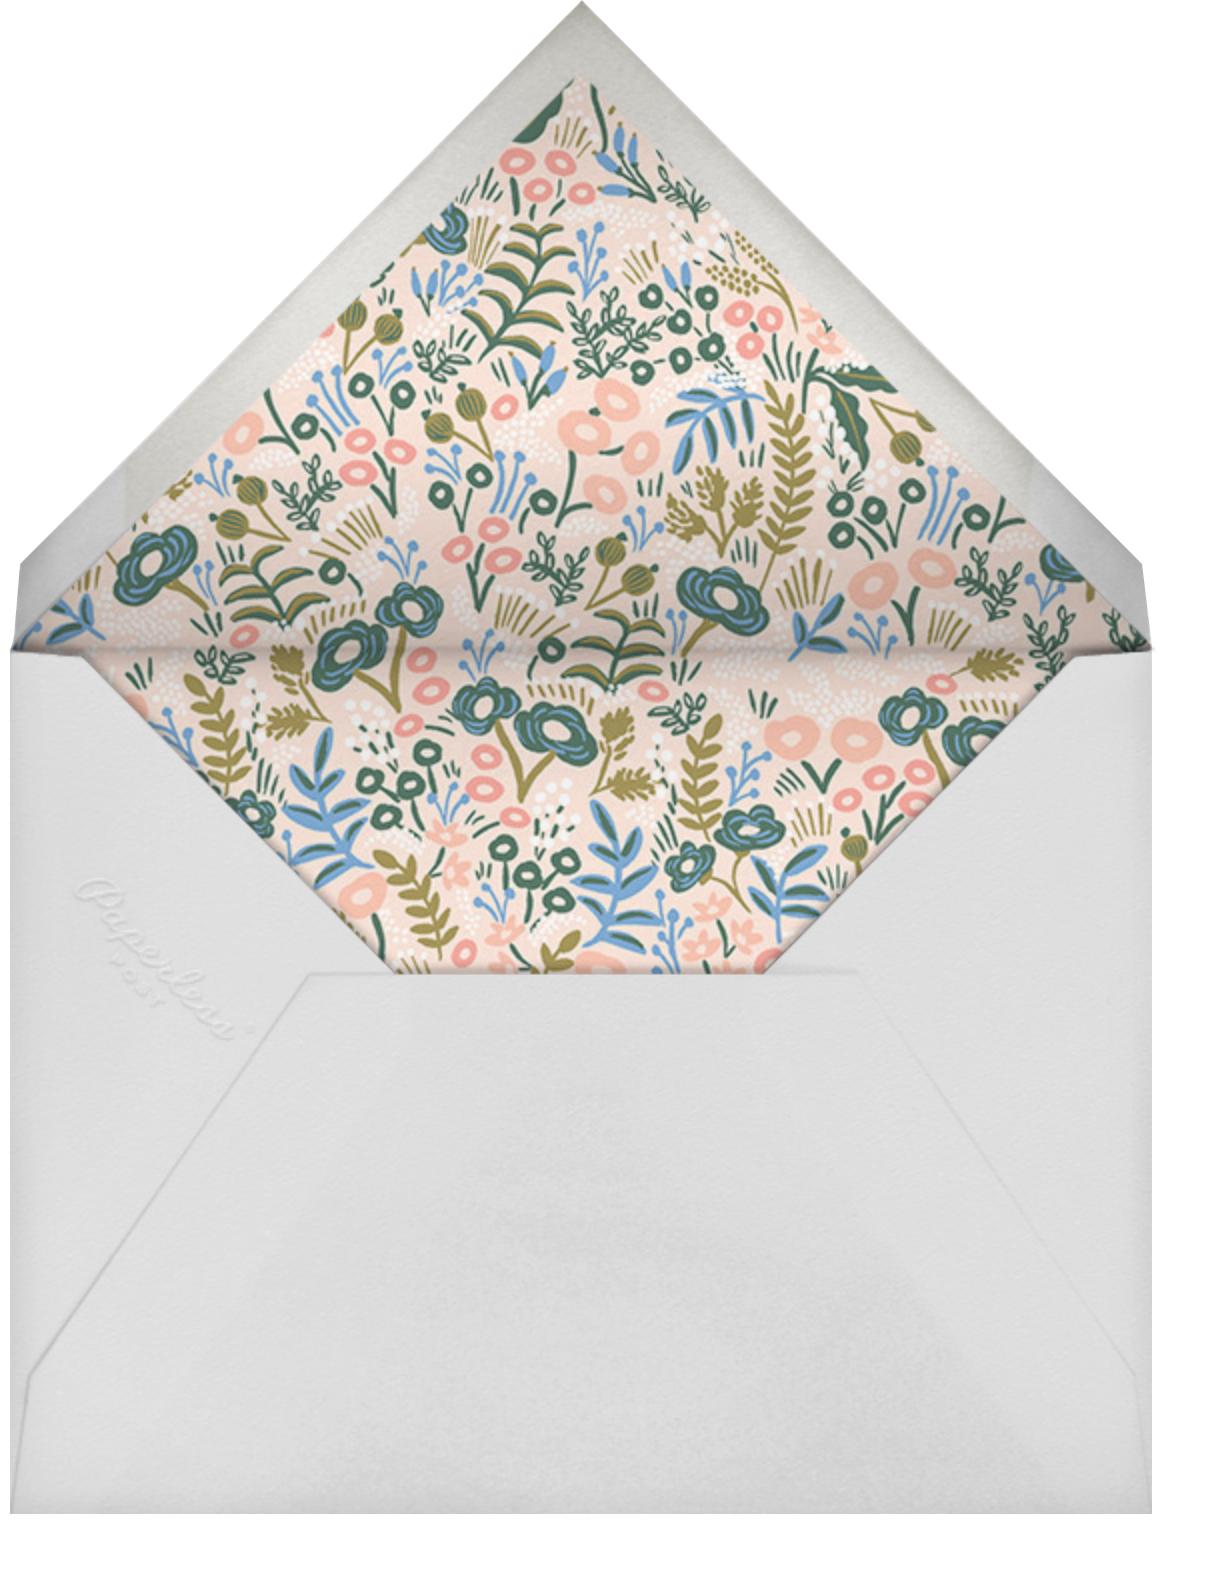 Floral Tapestry (Invitation) - Pavlova - Rifle Paper Co. - All - envelope back